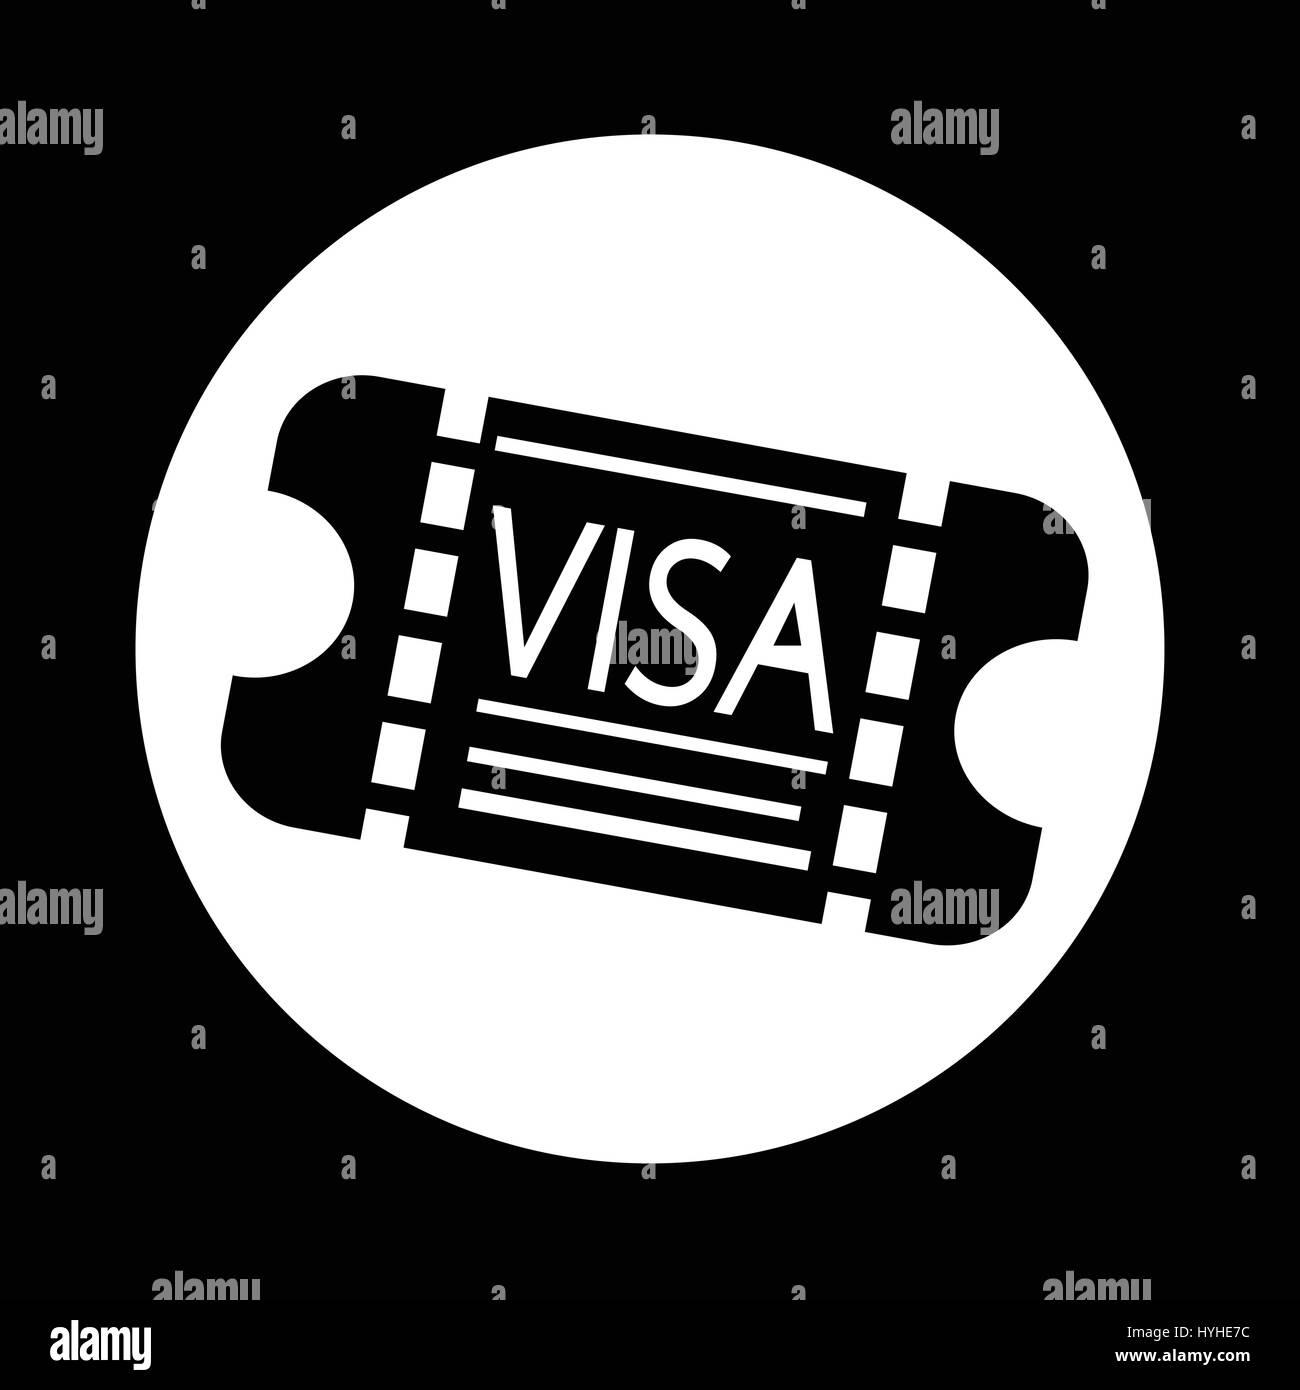 Entrance visa icon stock vector art illustration vector image entrance visa icon biocorpaavc Choice Image